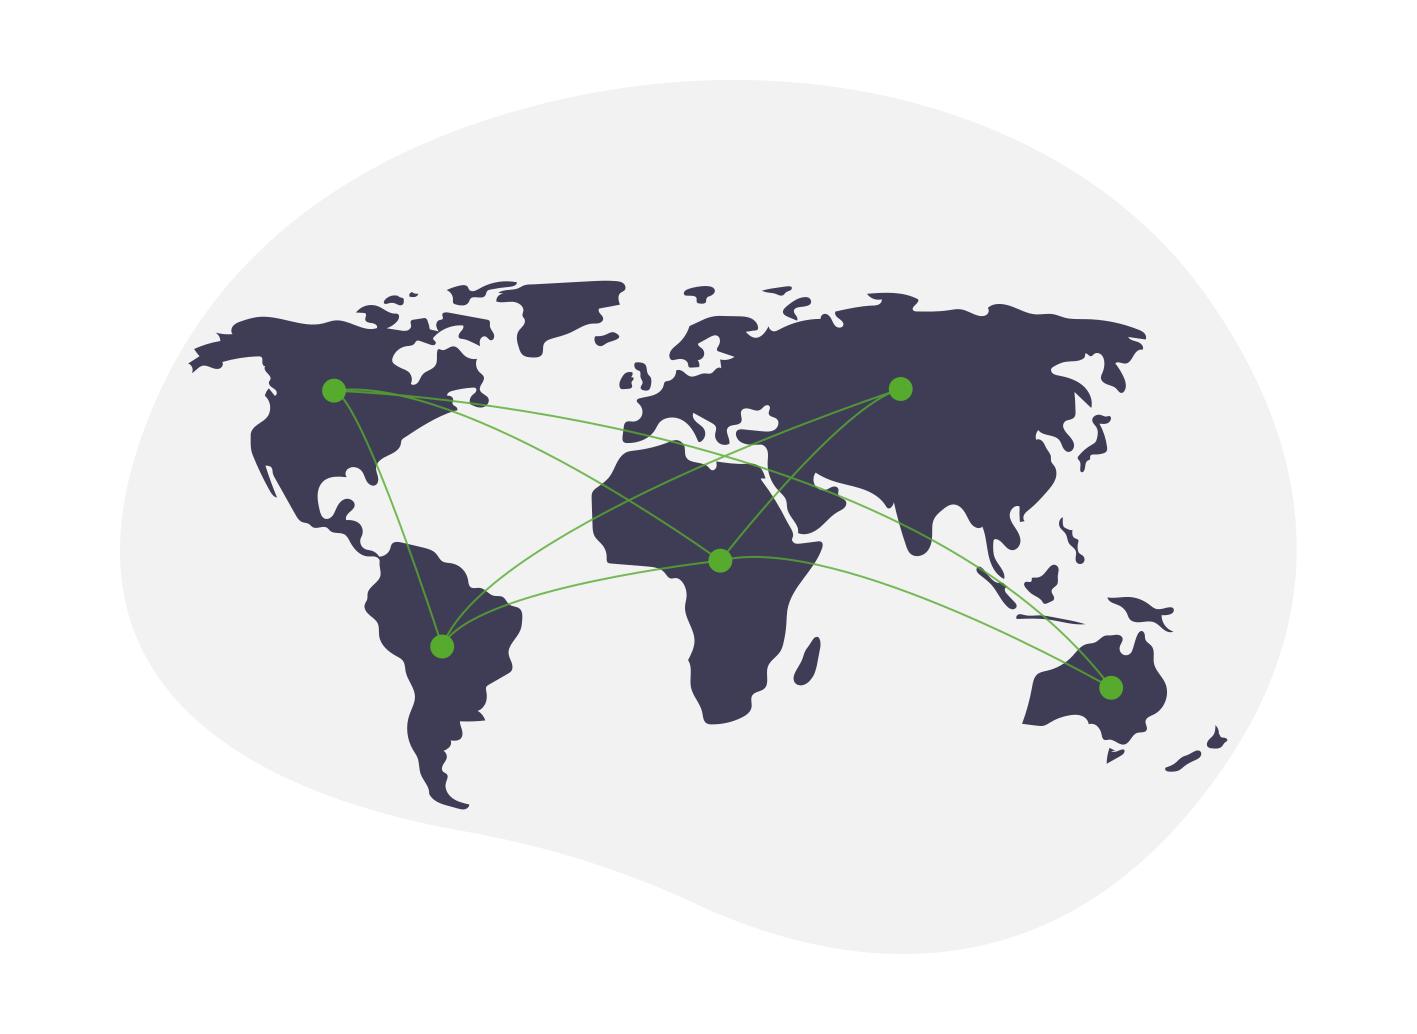 microsoft bing search partner network